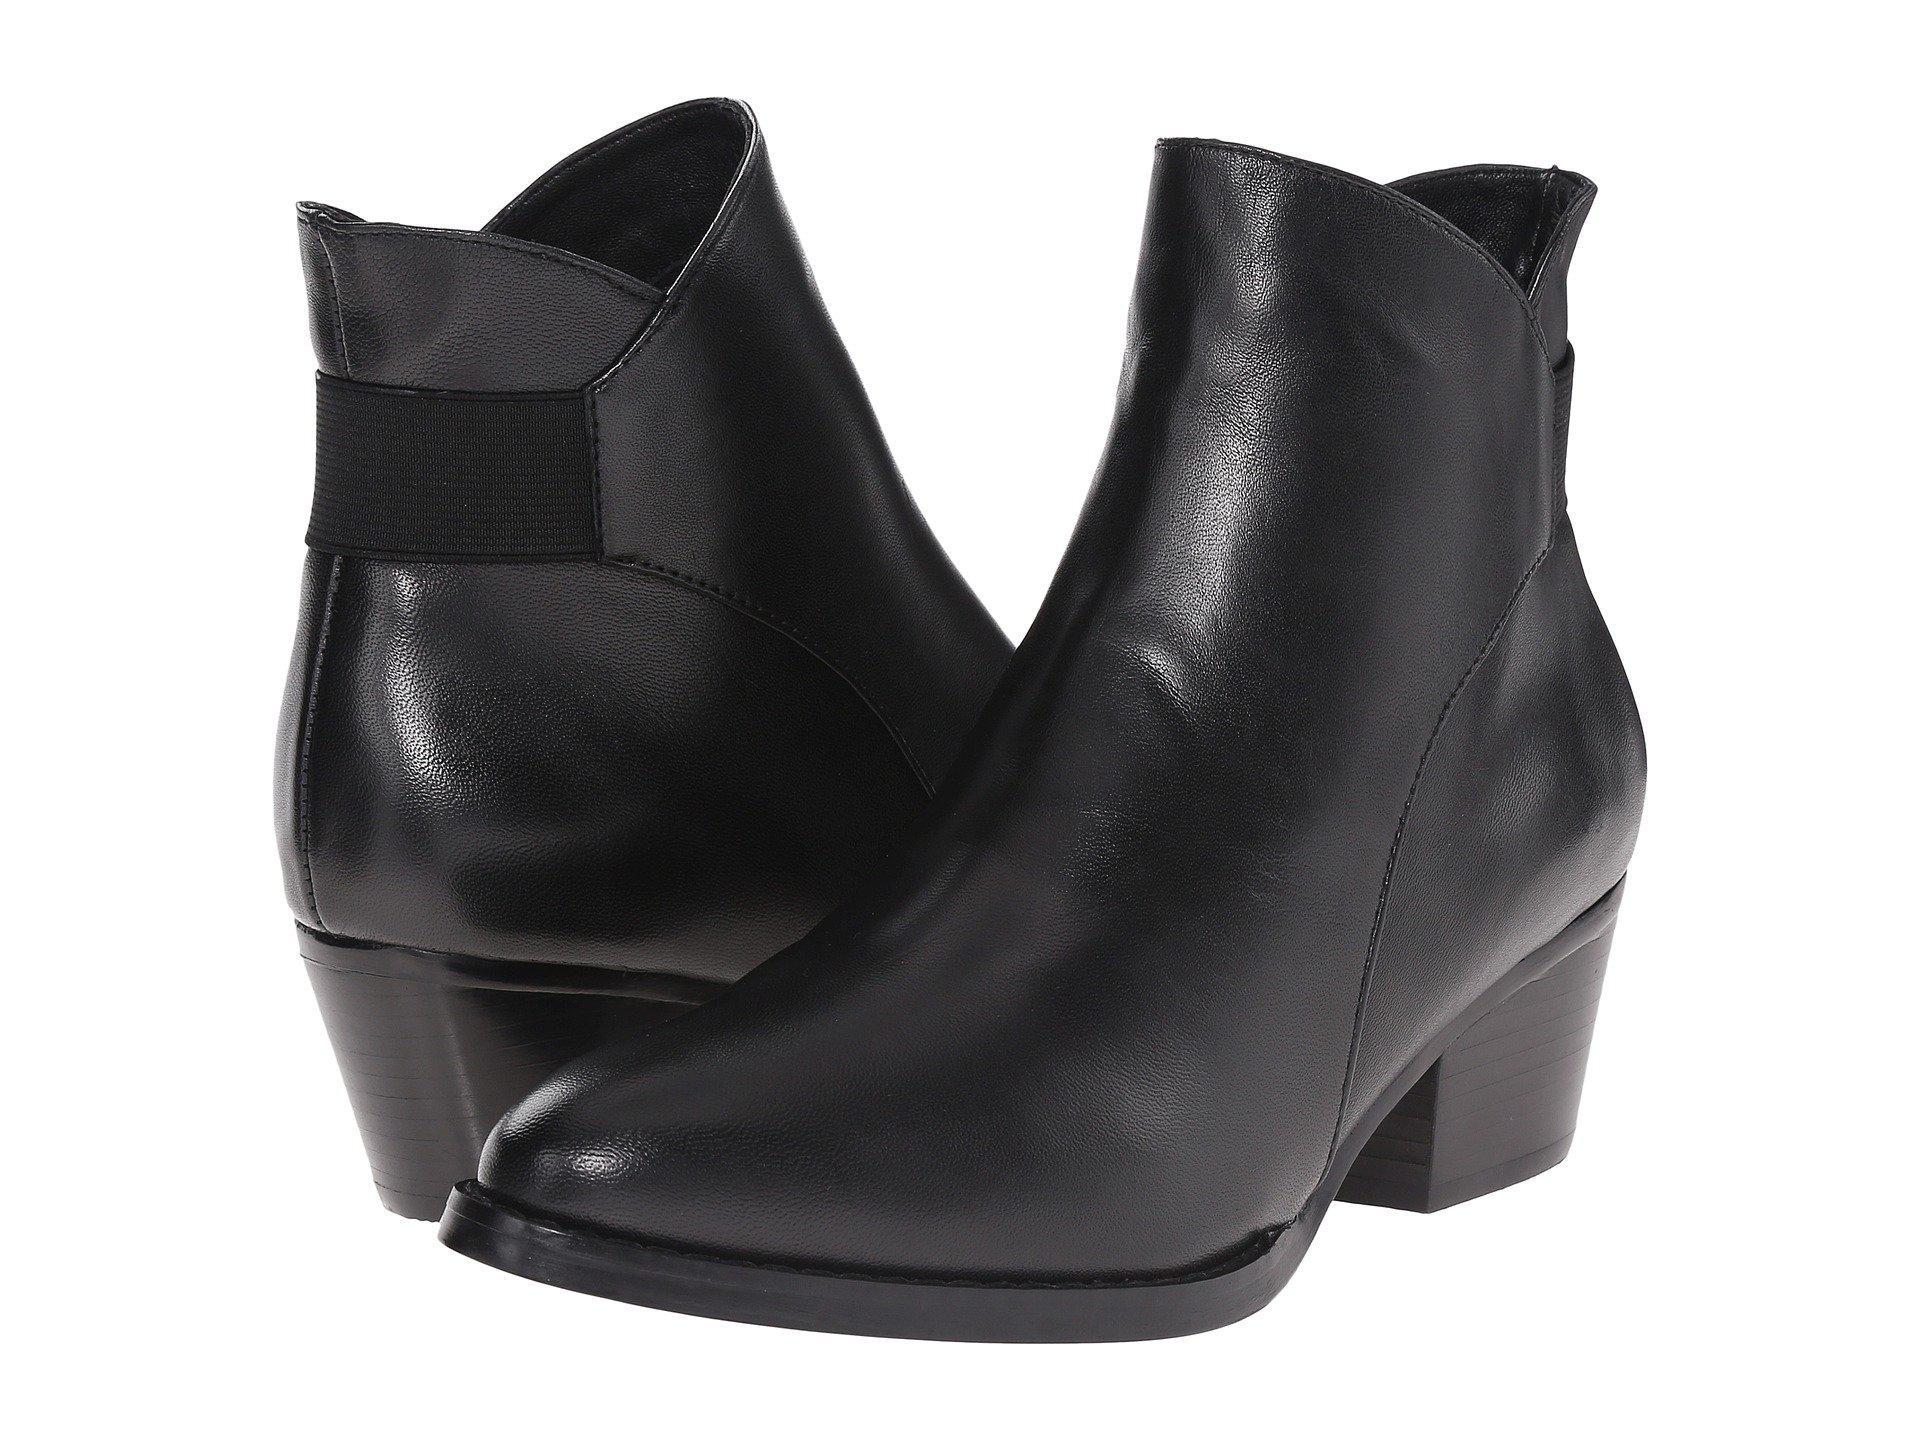 Womens Boots Vaneli Reagan Black Suede/Matching Elastic